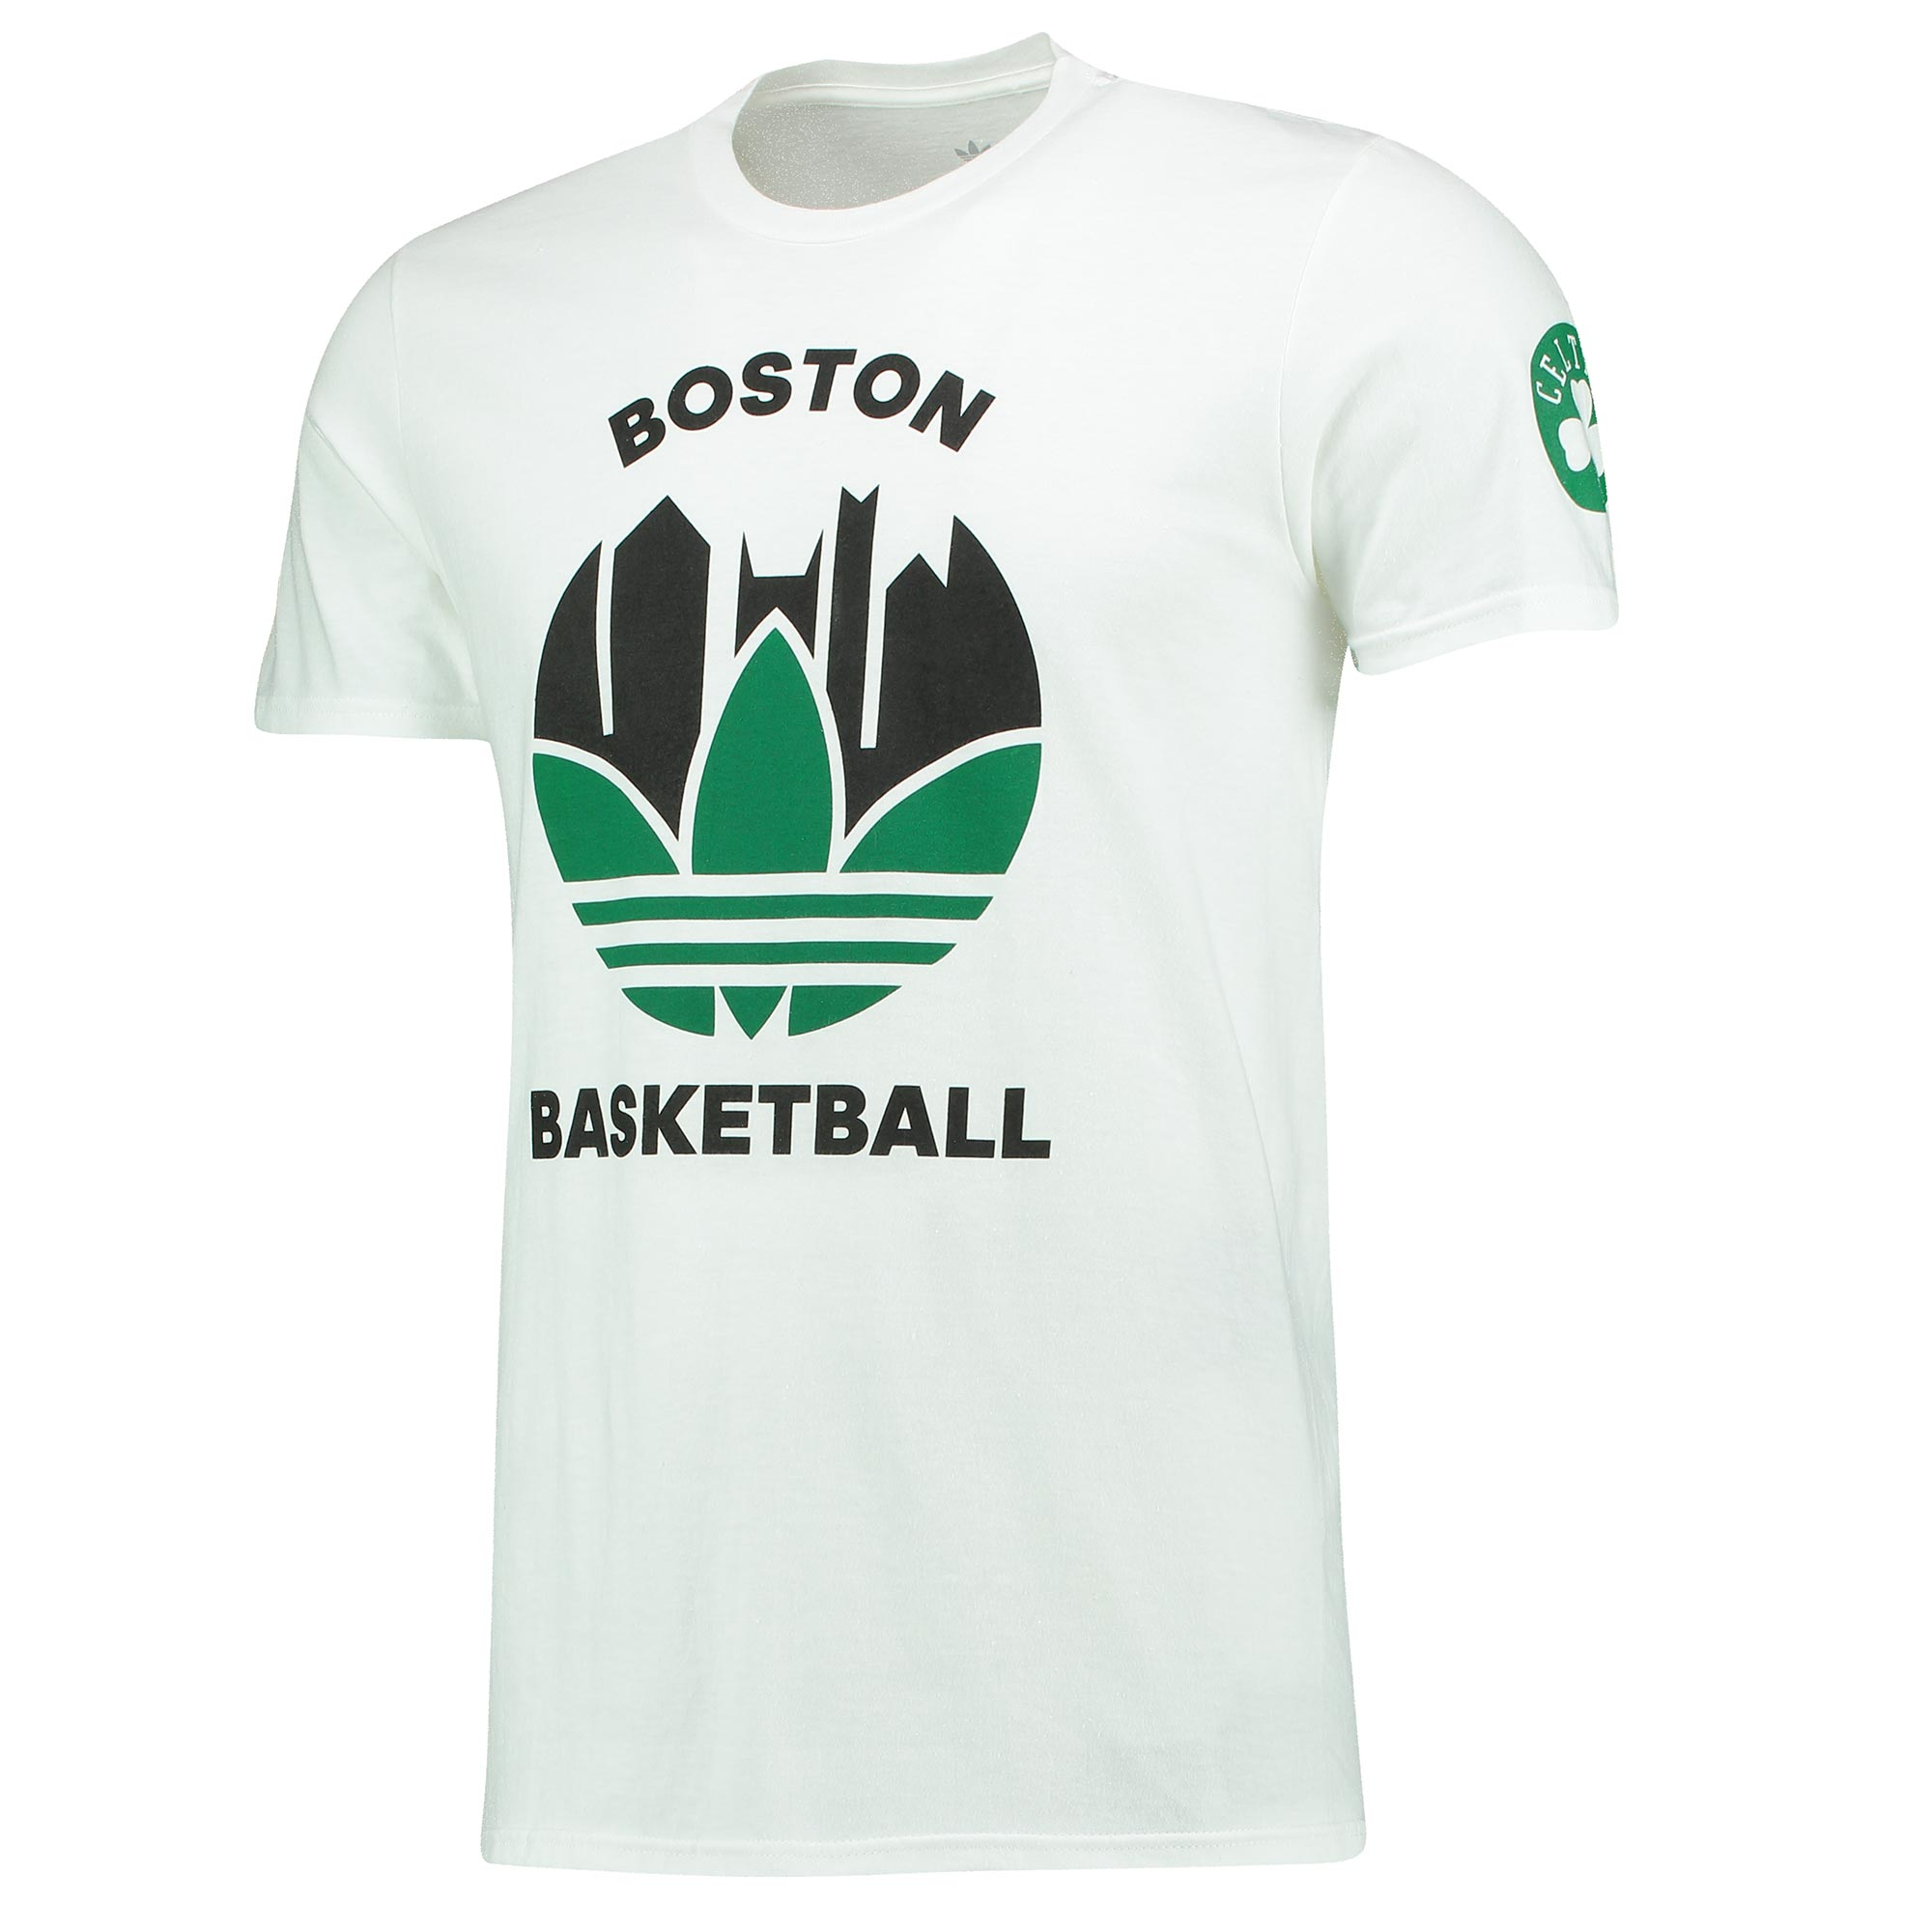 Boston Celtics Originals Trefoil City T-Shirt